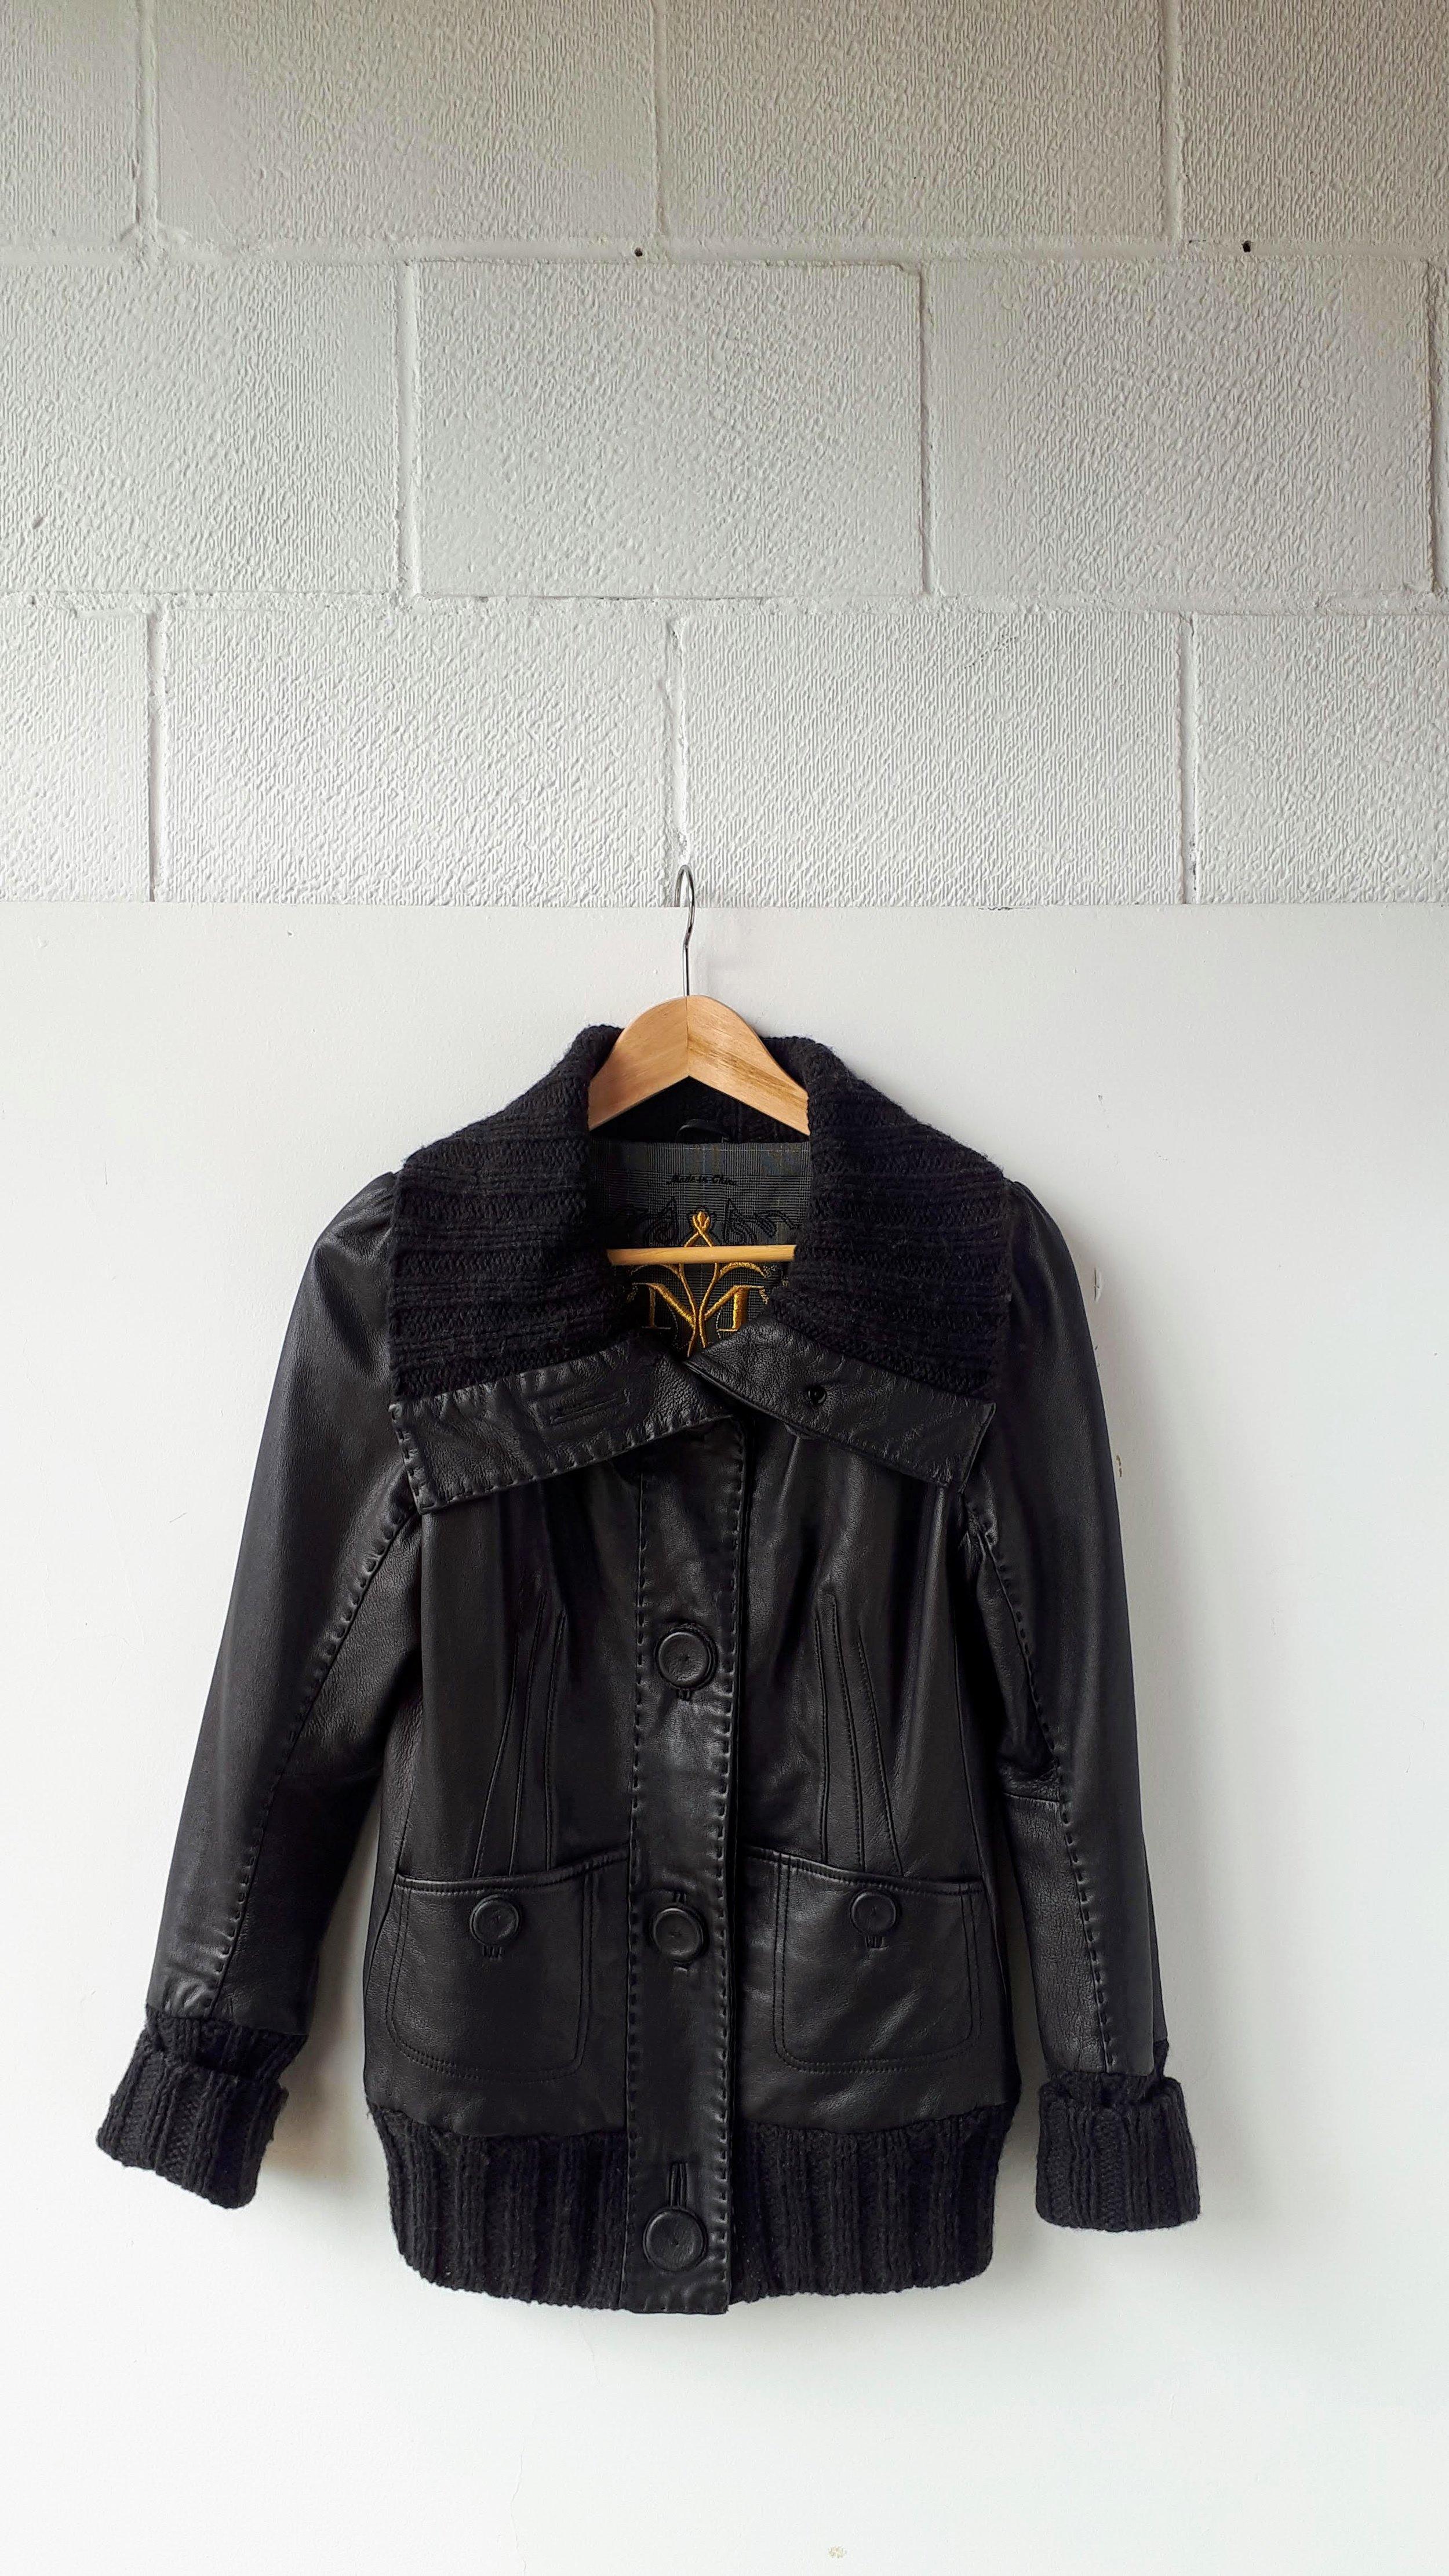 Mackage jacket; Size XS, $225